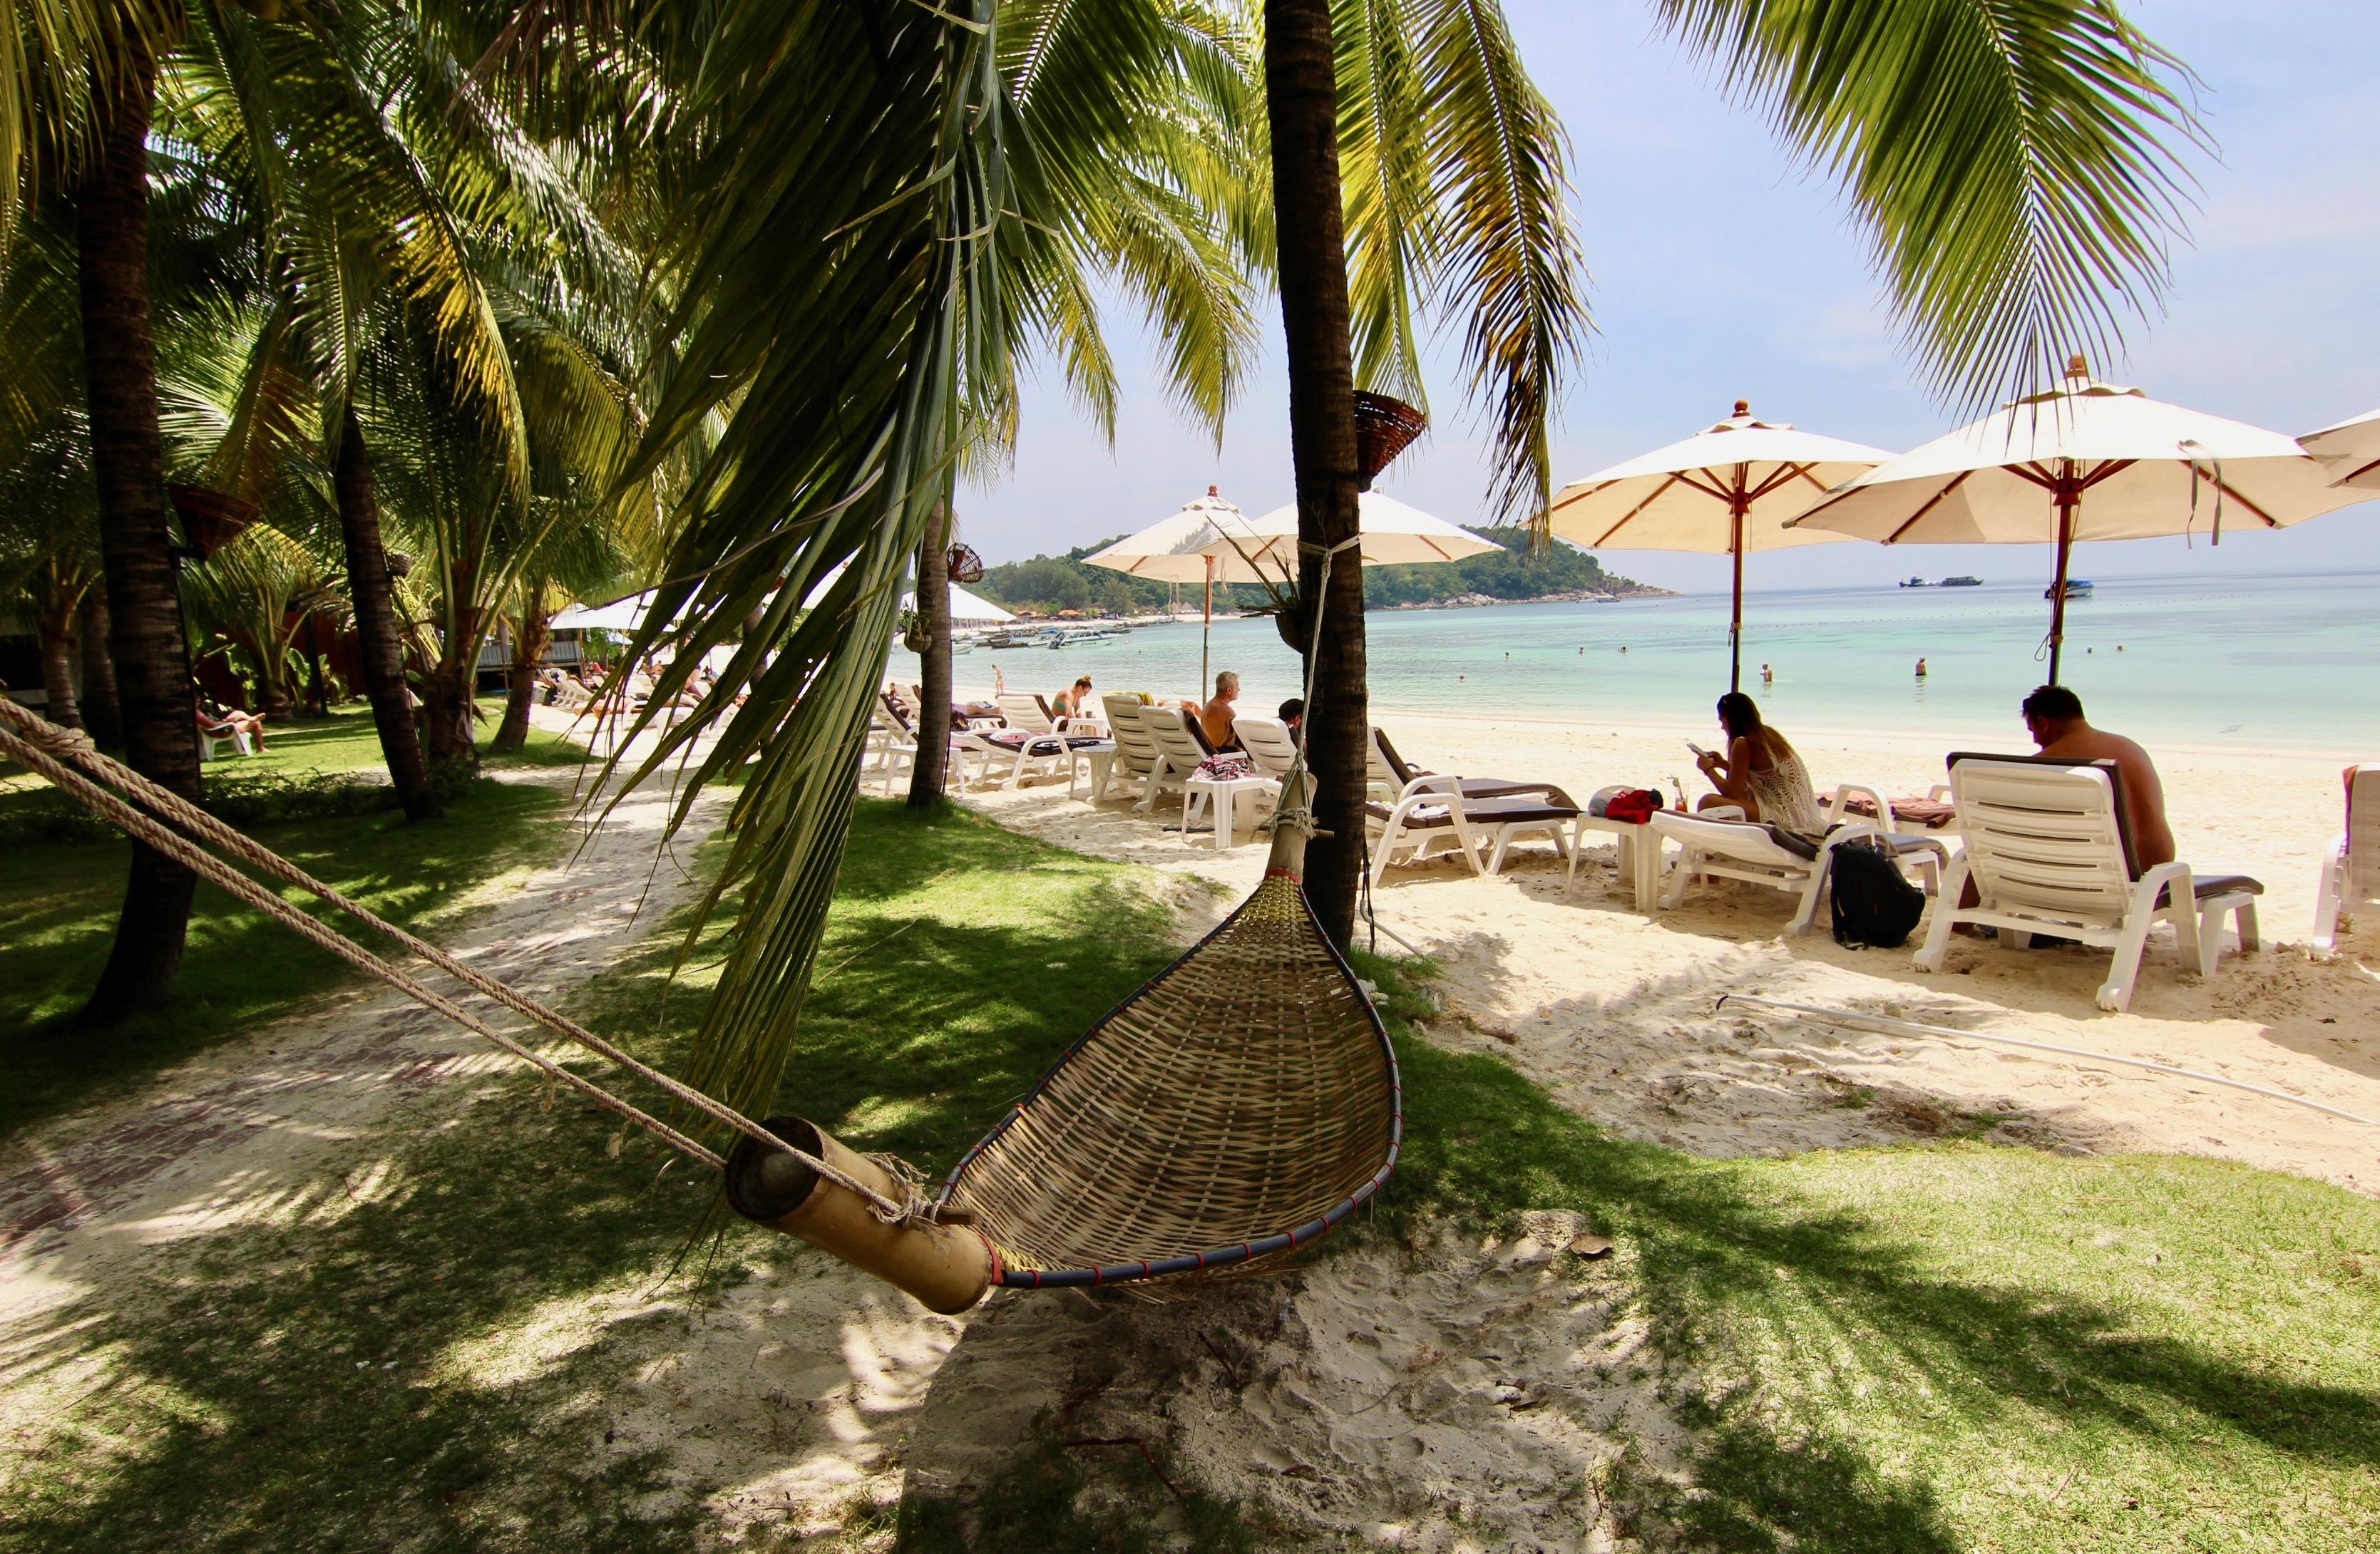 @tenesommer's cover photo for 'Where to stay in Koh Lipe? Mali Resort! | Marbella Blog by Tene Sommer'